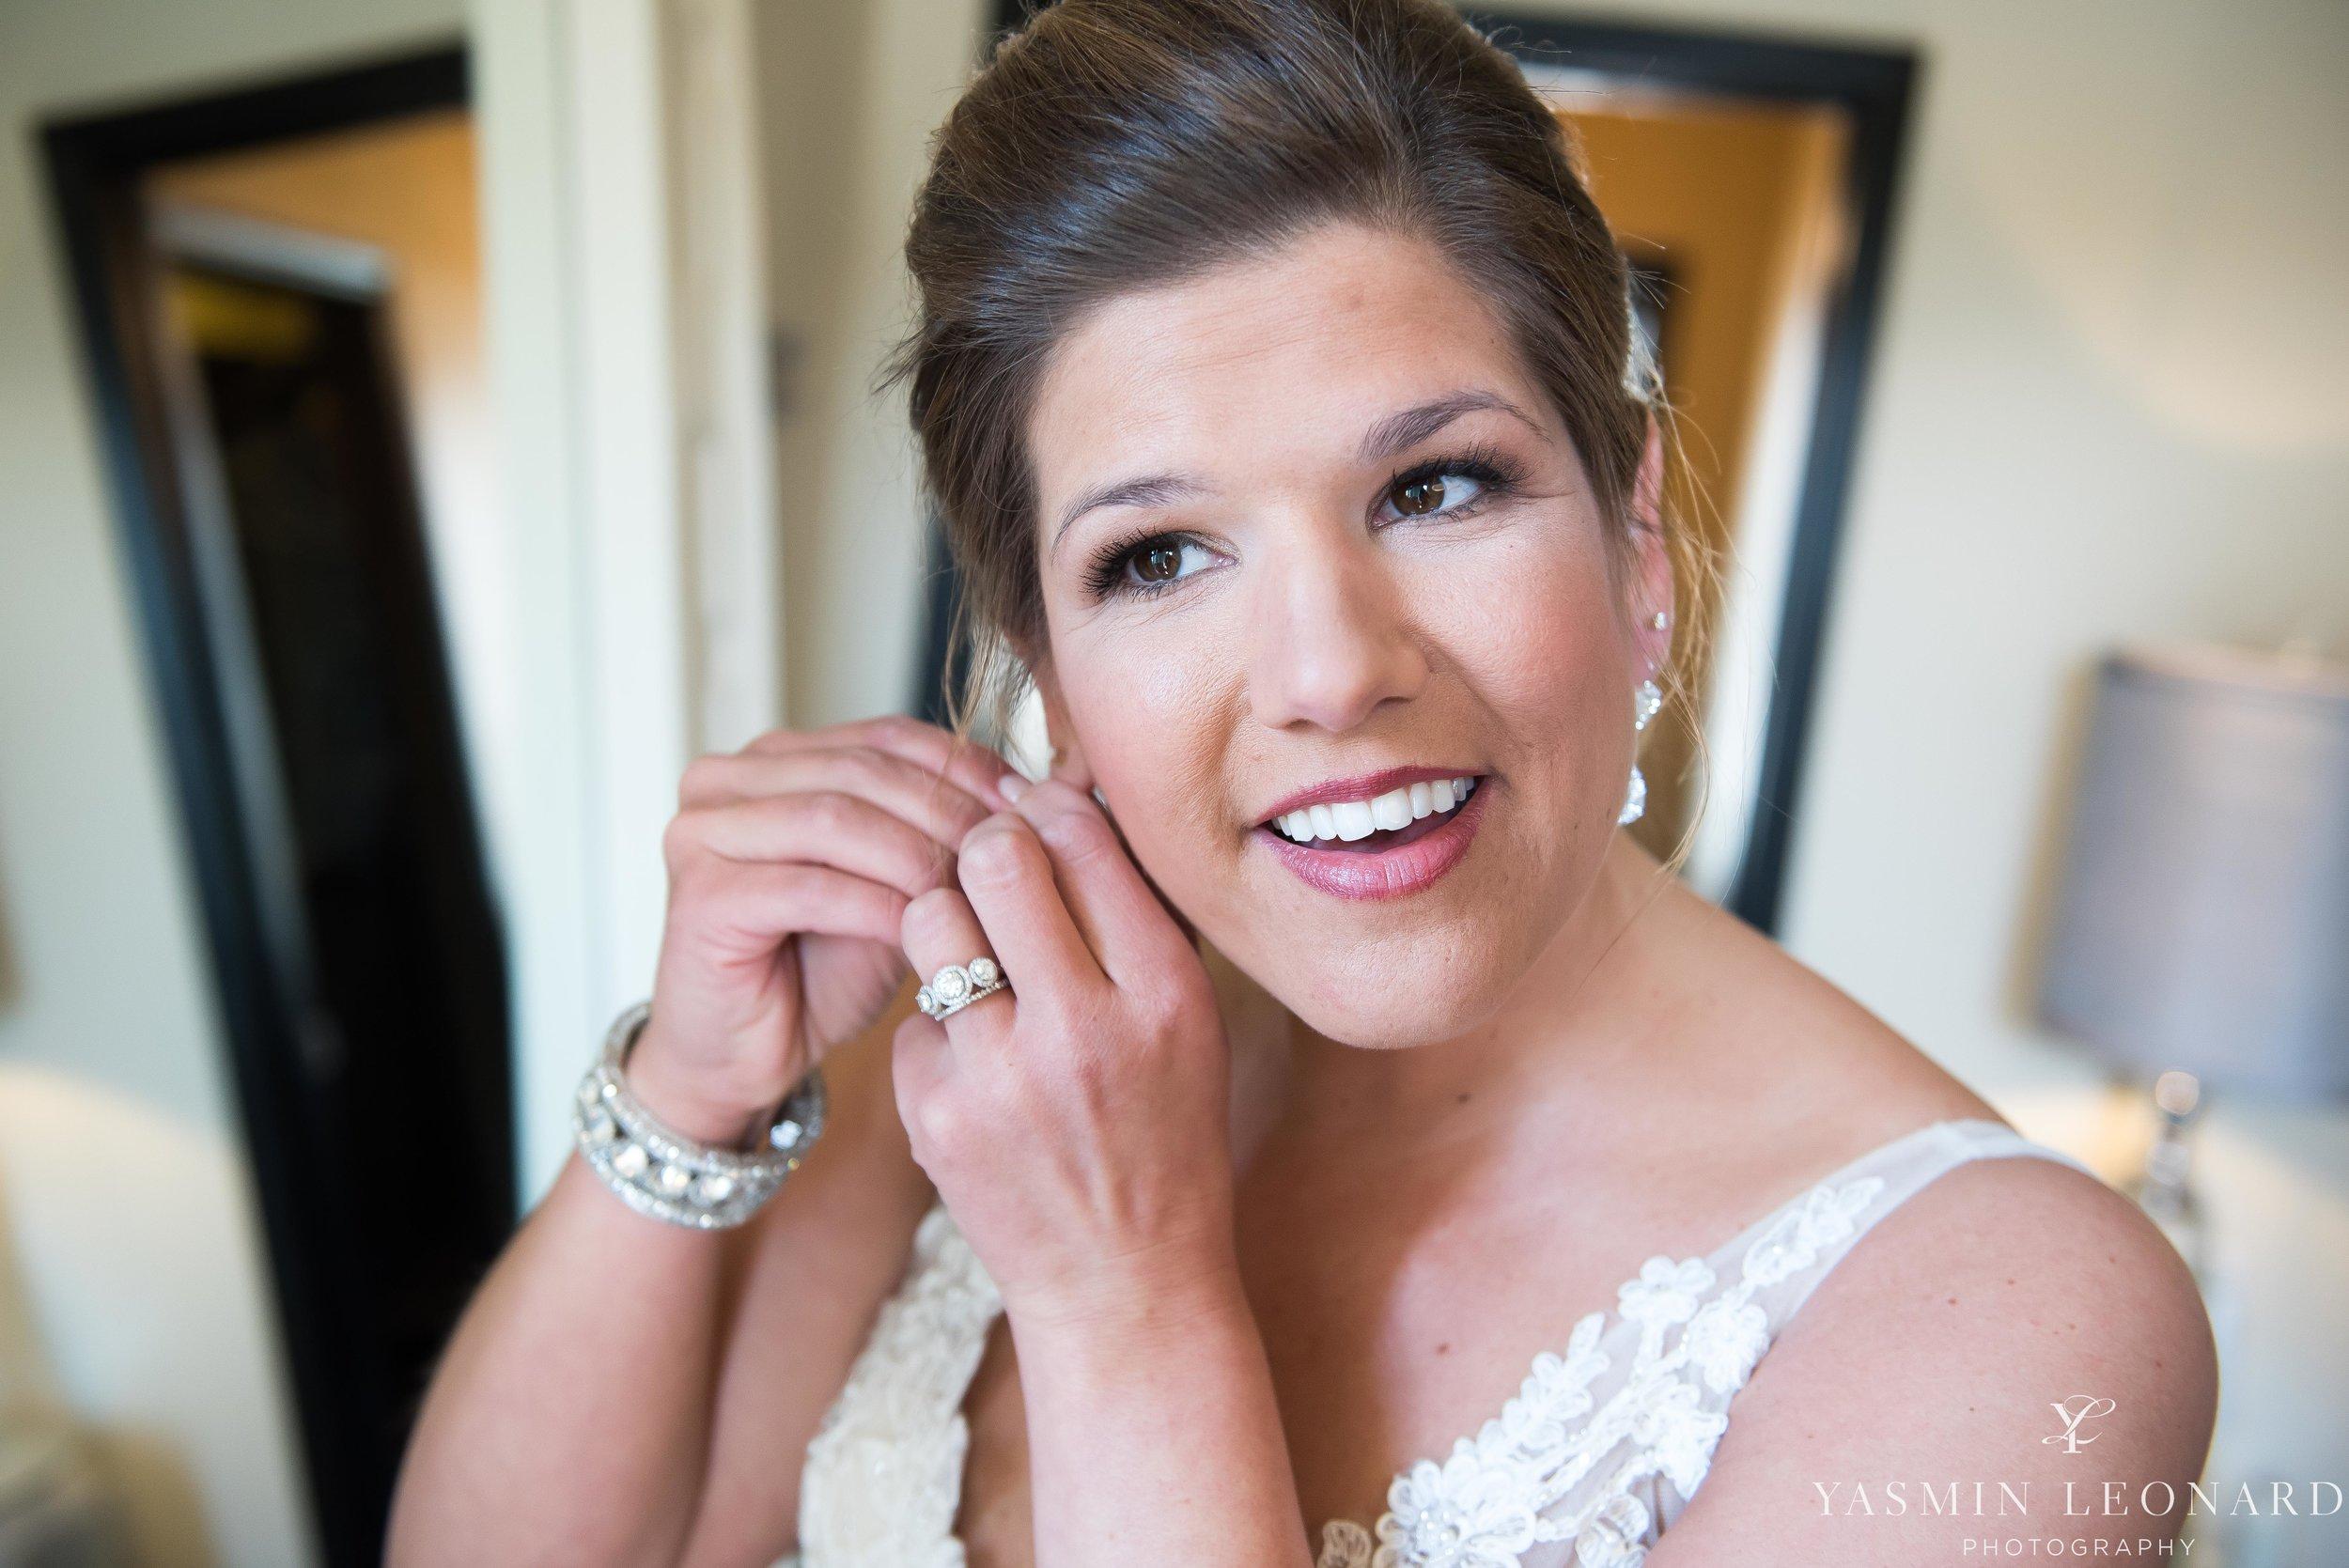 Adaumont Farm - Adaumont Farm Weddings - Trinity Weddings - NC Weddings - Yasmin Leonard Photography-10.jpg